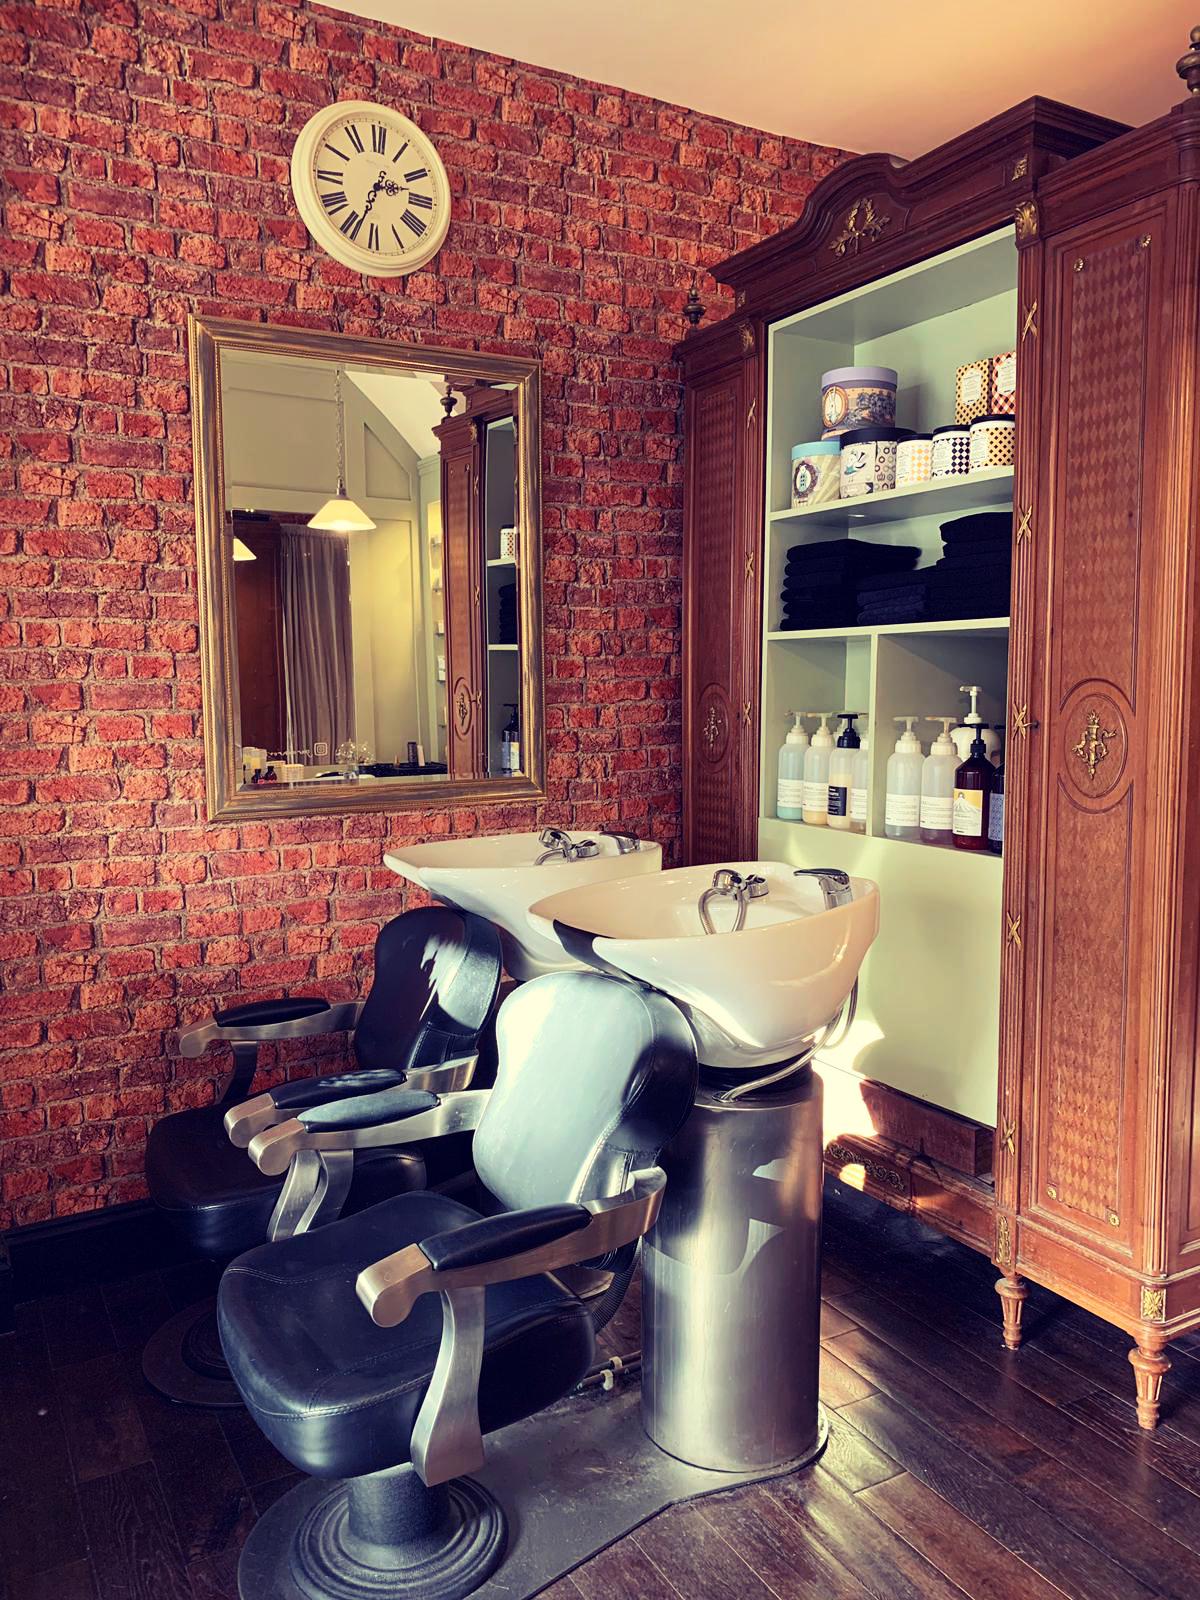 Garden Room Hairdresser Leyton